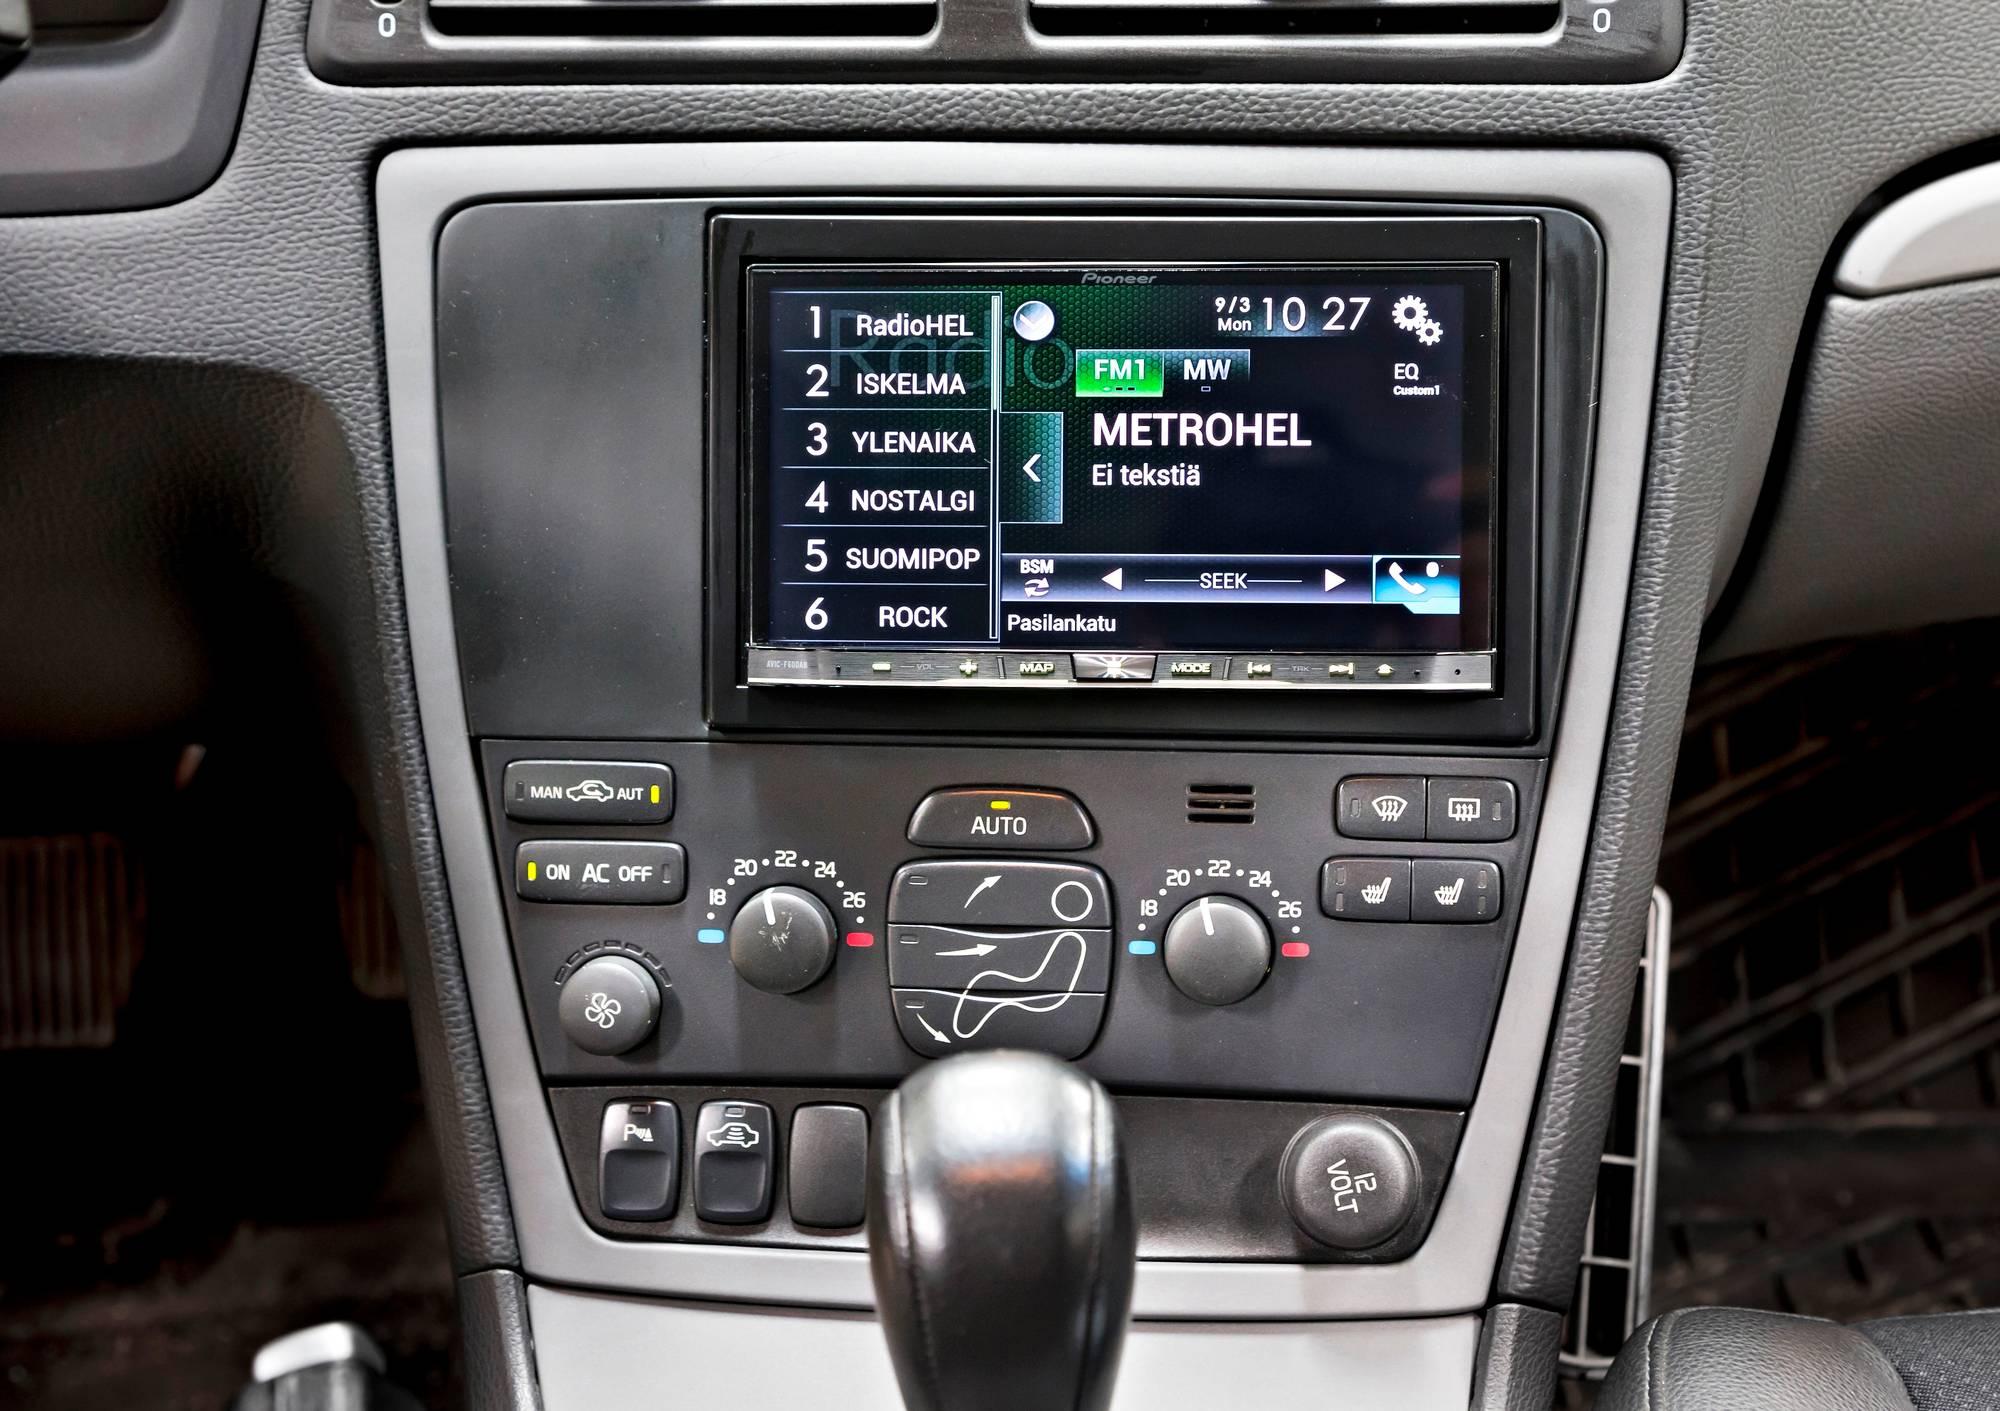 auto liittyy lypuhelimeen apple carplay android auto ja mirrorlink. Black Bedroom Furniture Sets. Home Design Ideas